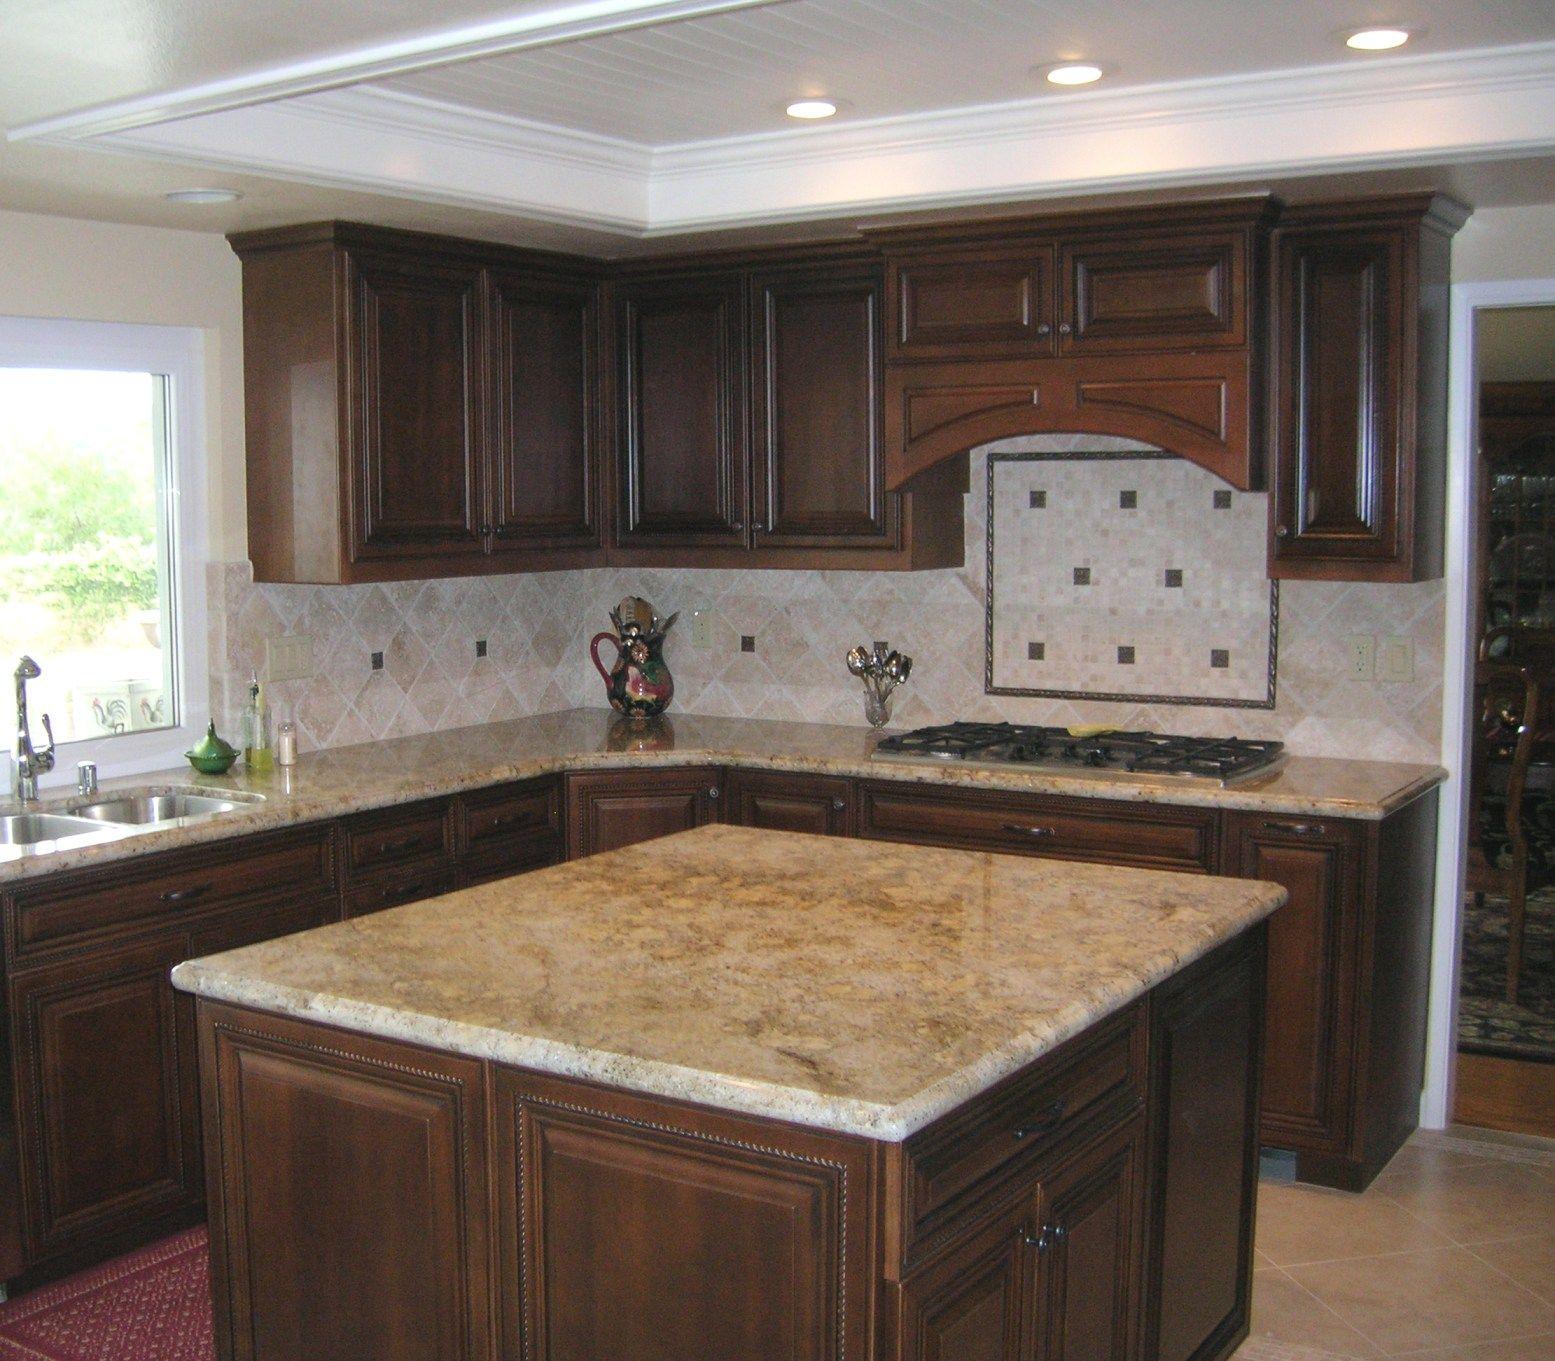 Floating Kitchen Island Designs: Island And Hood Ideas